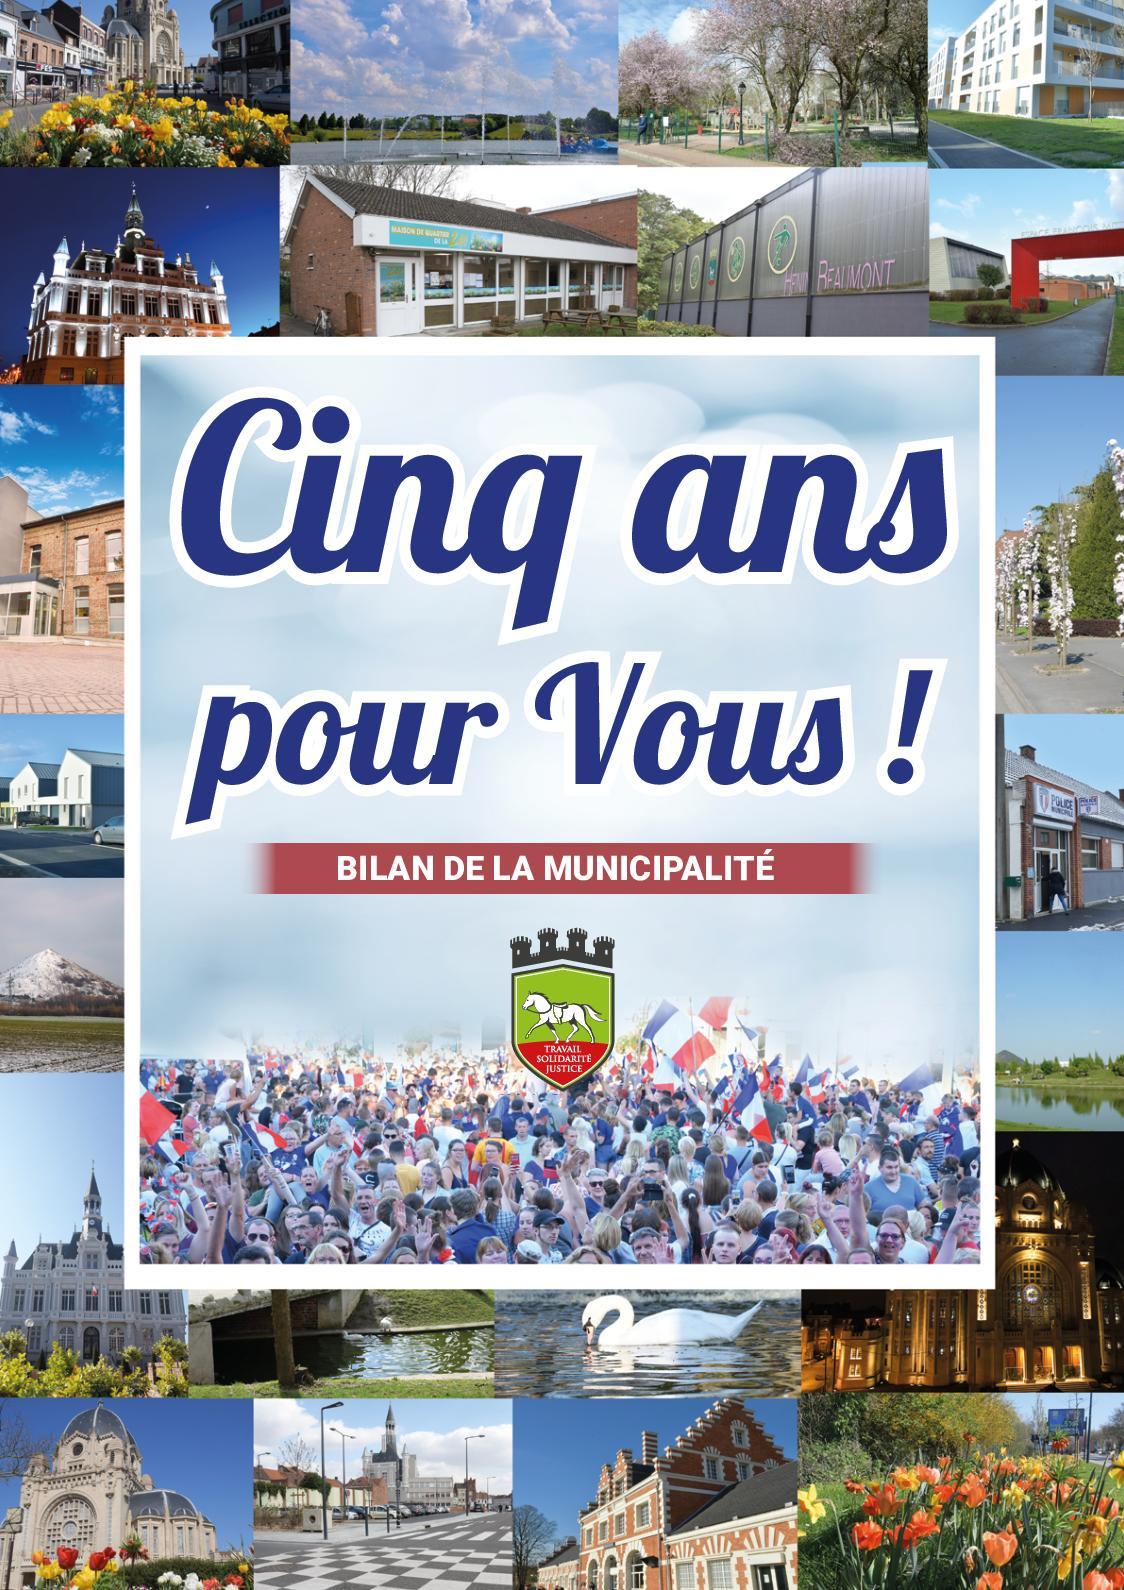 Bilan des 5 ans - Municipalité d'Hénin-Beaumont